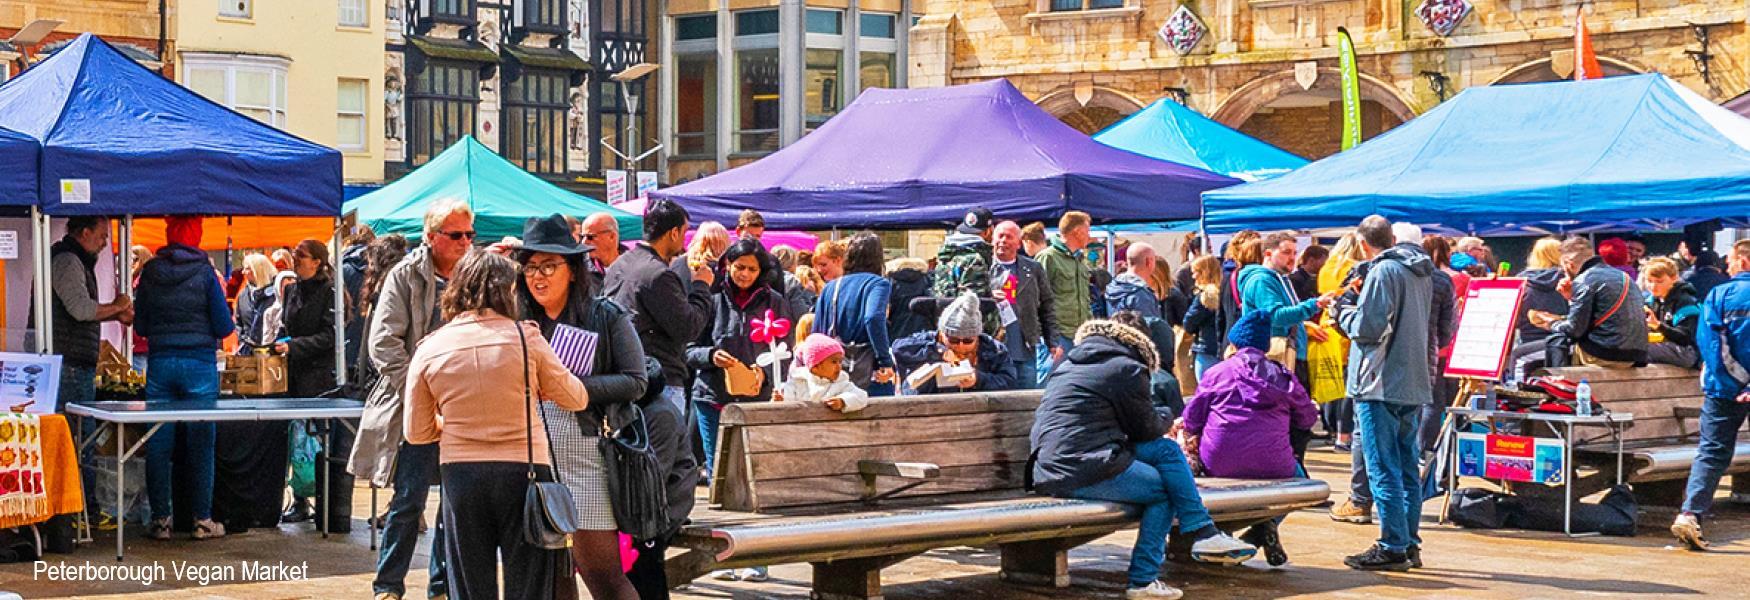 Peterborough Vegan Market in Cathedral Square